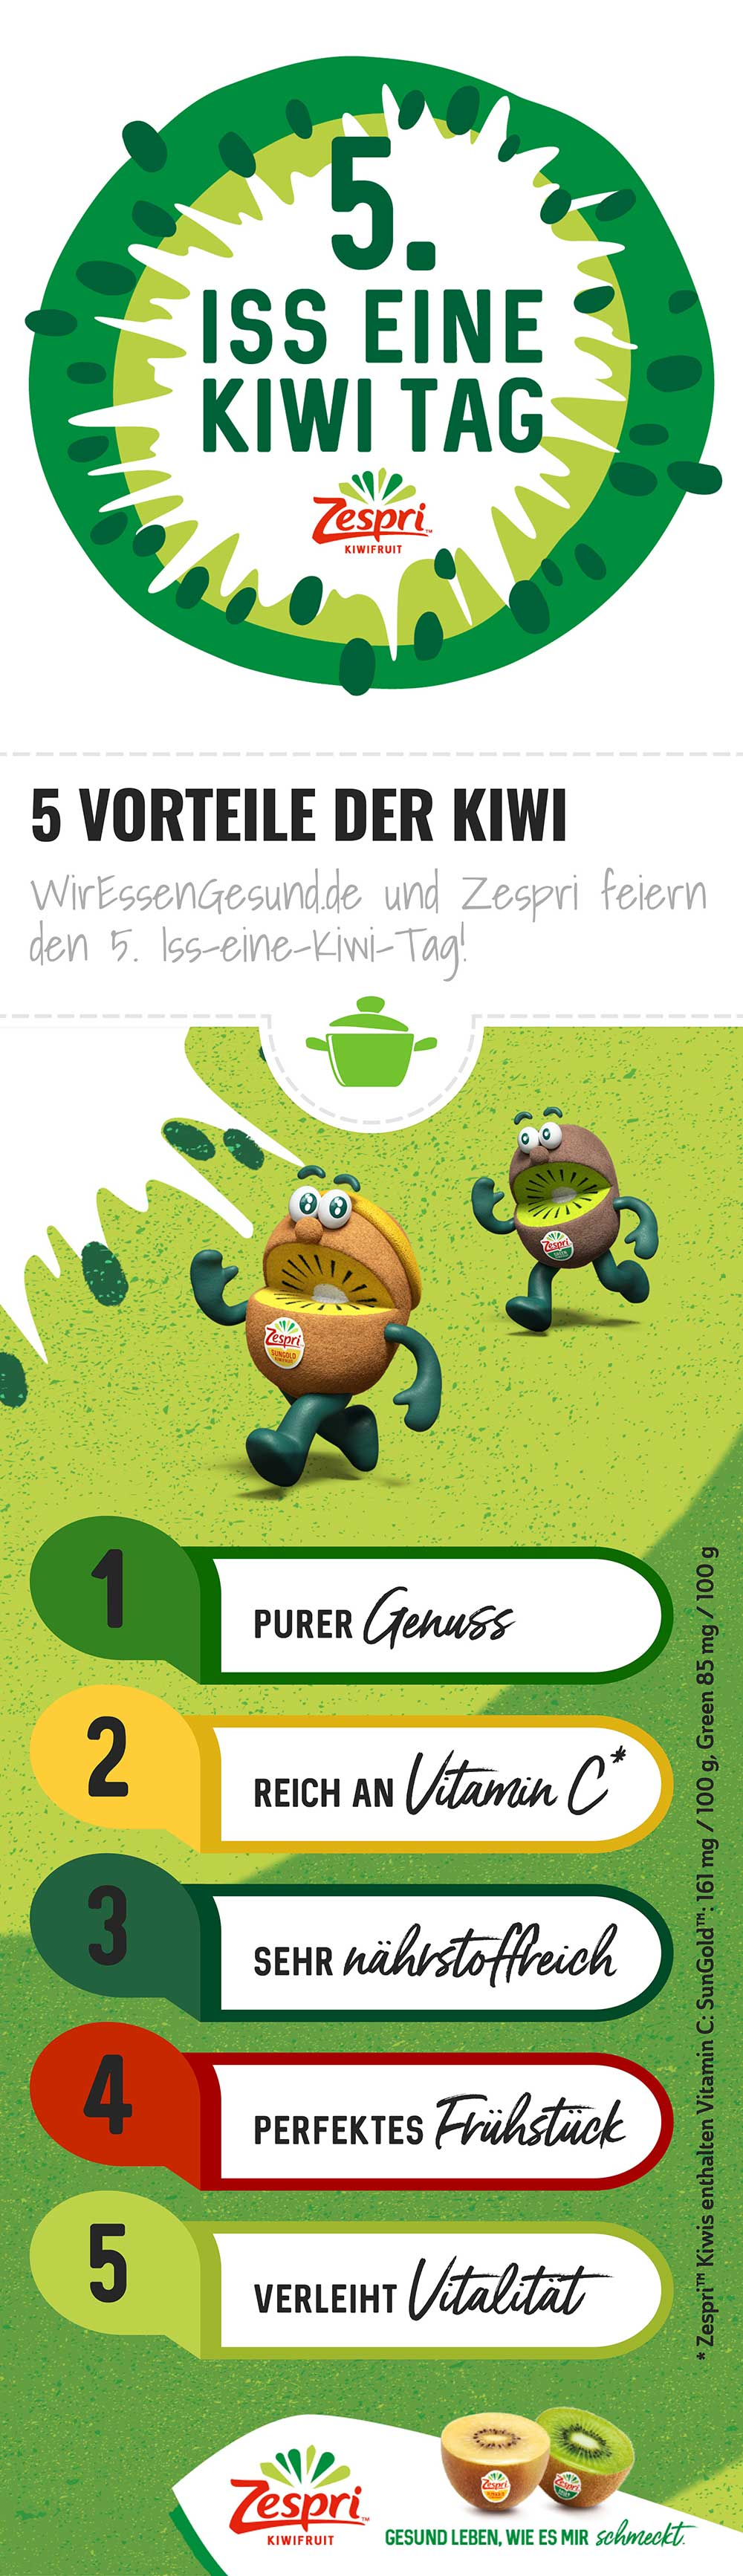 Infografik Kiwi 5 Vorteile